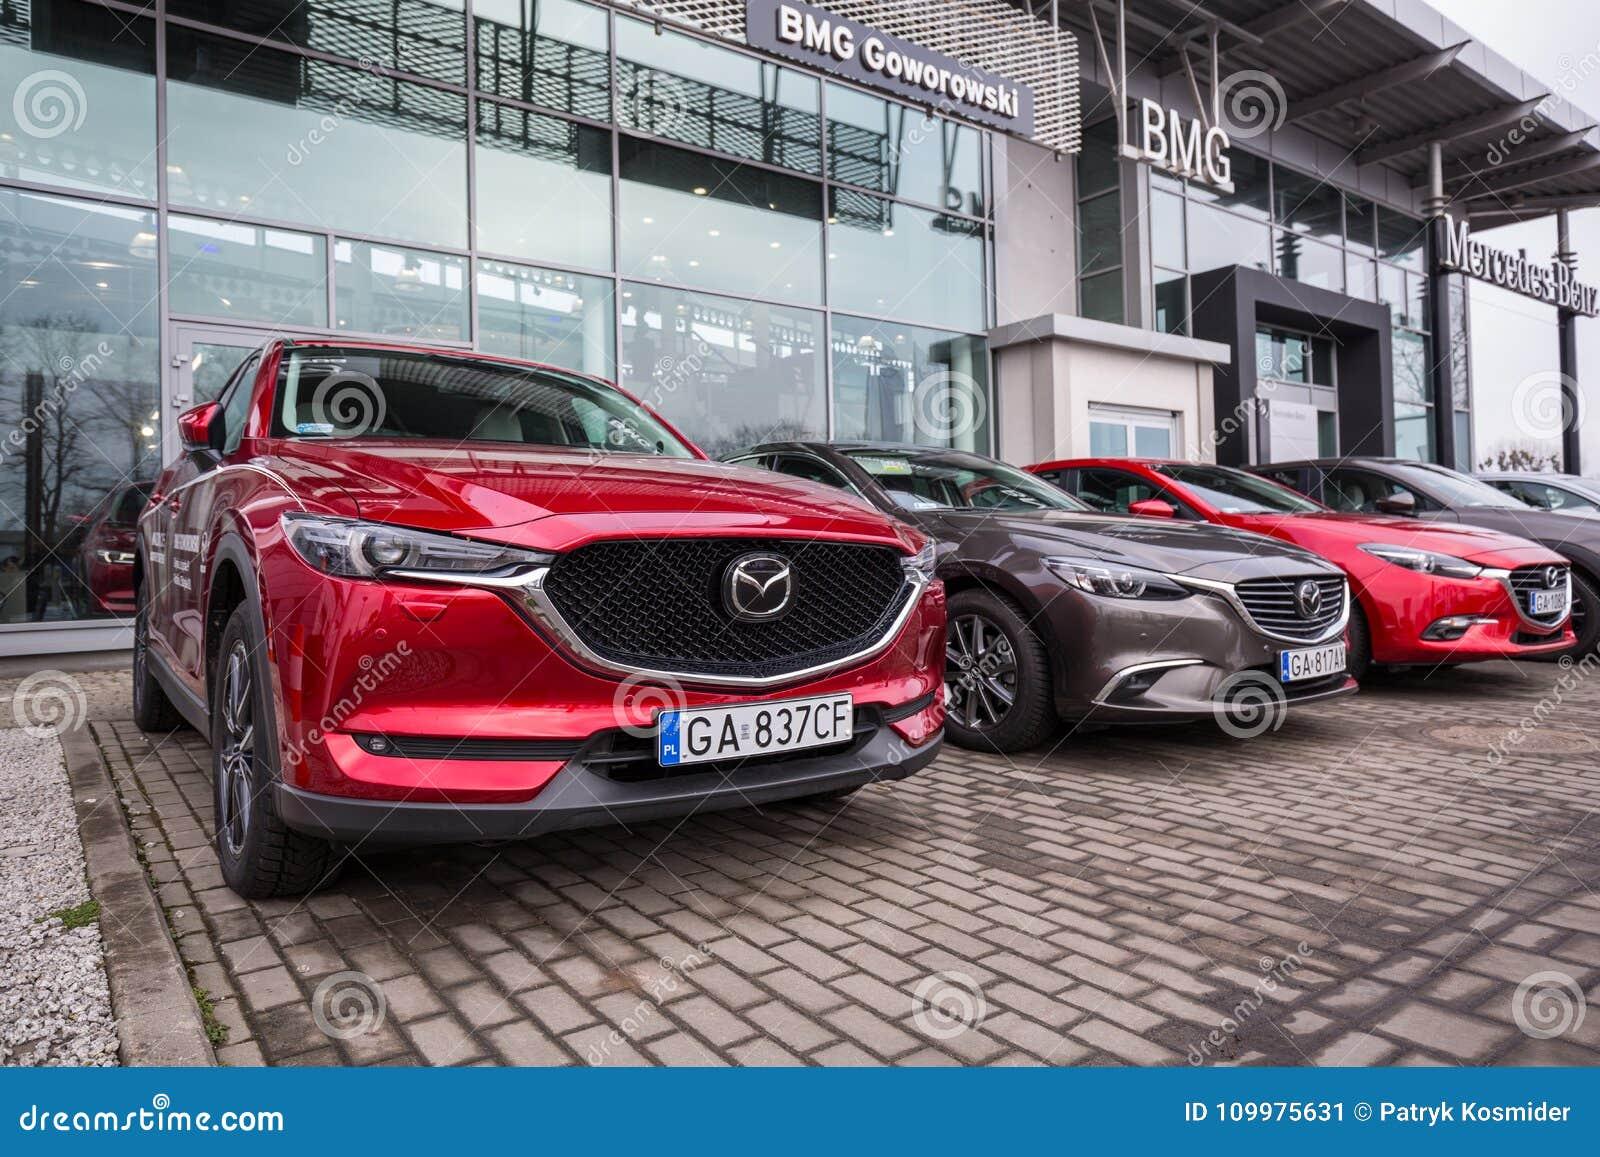 Mazda Dealerships In Georgia >> Mazda Cx 5 At The Car Showroom Editorial Photo Image Of